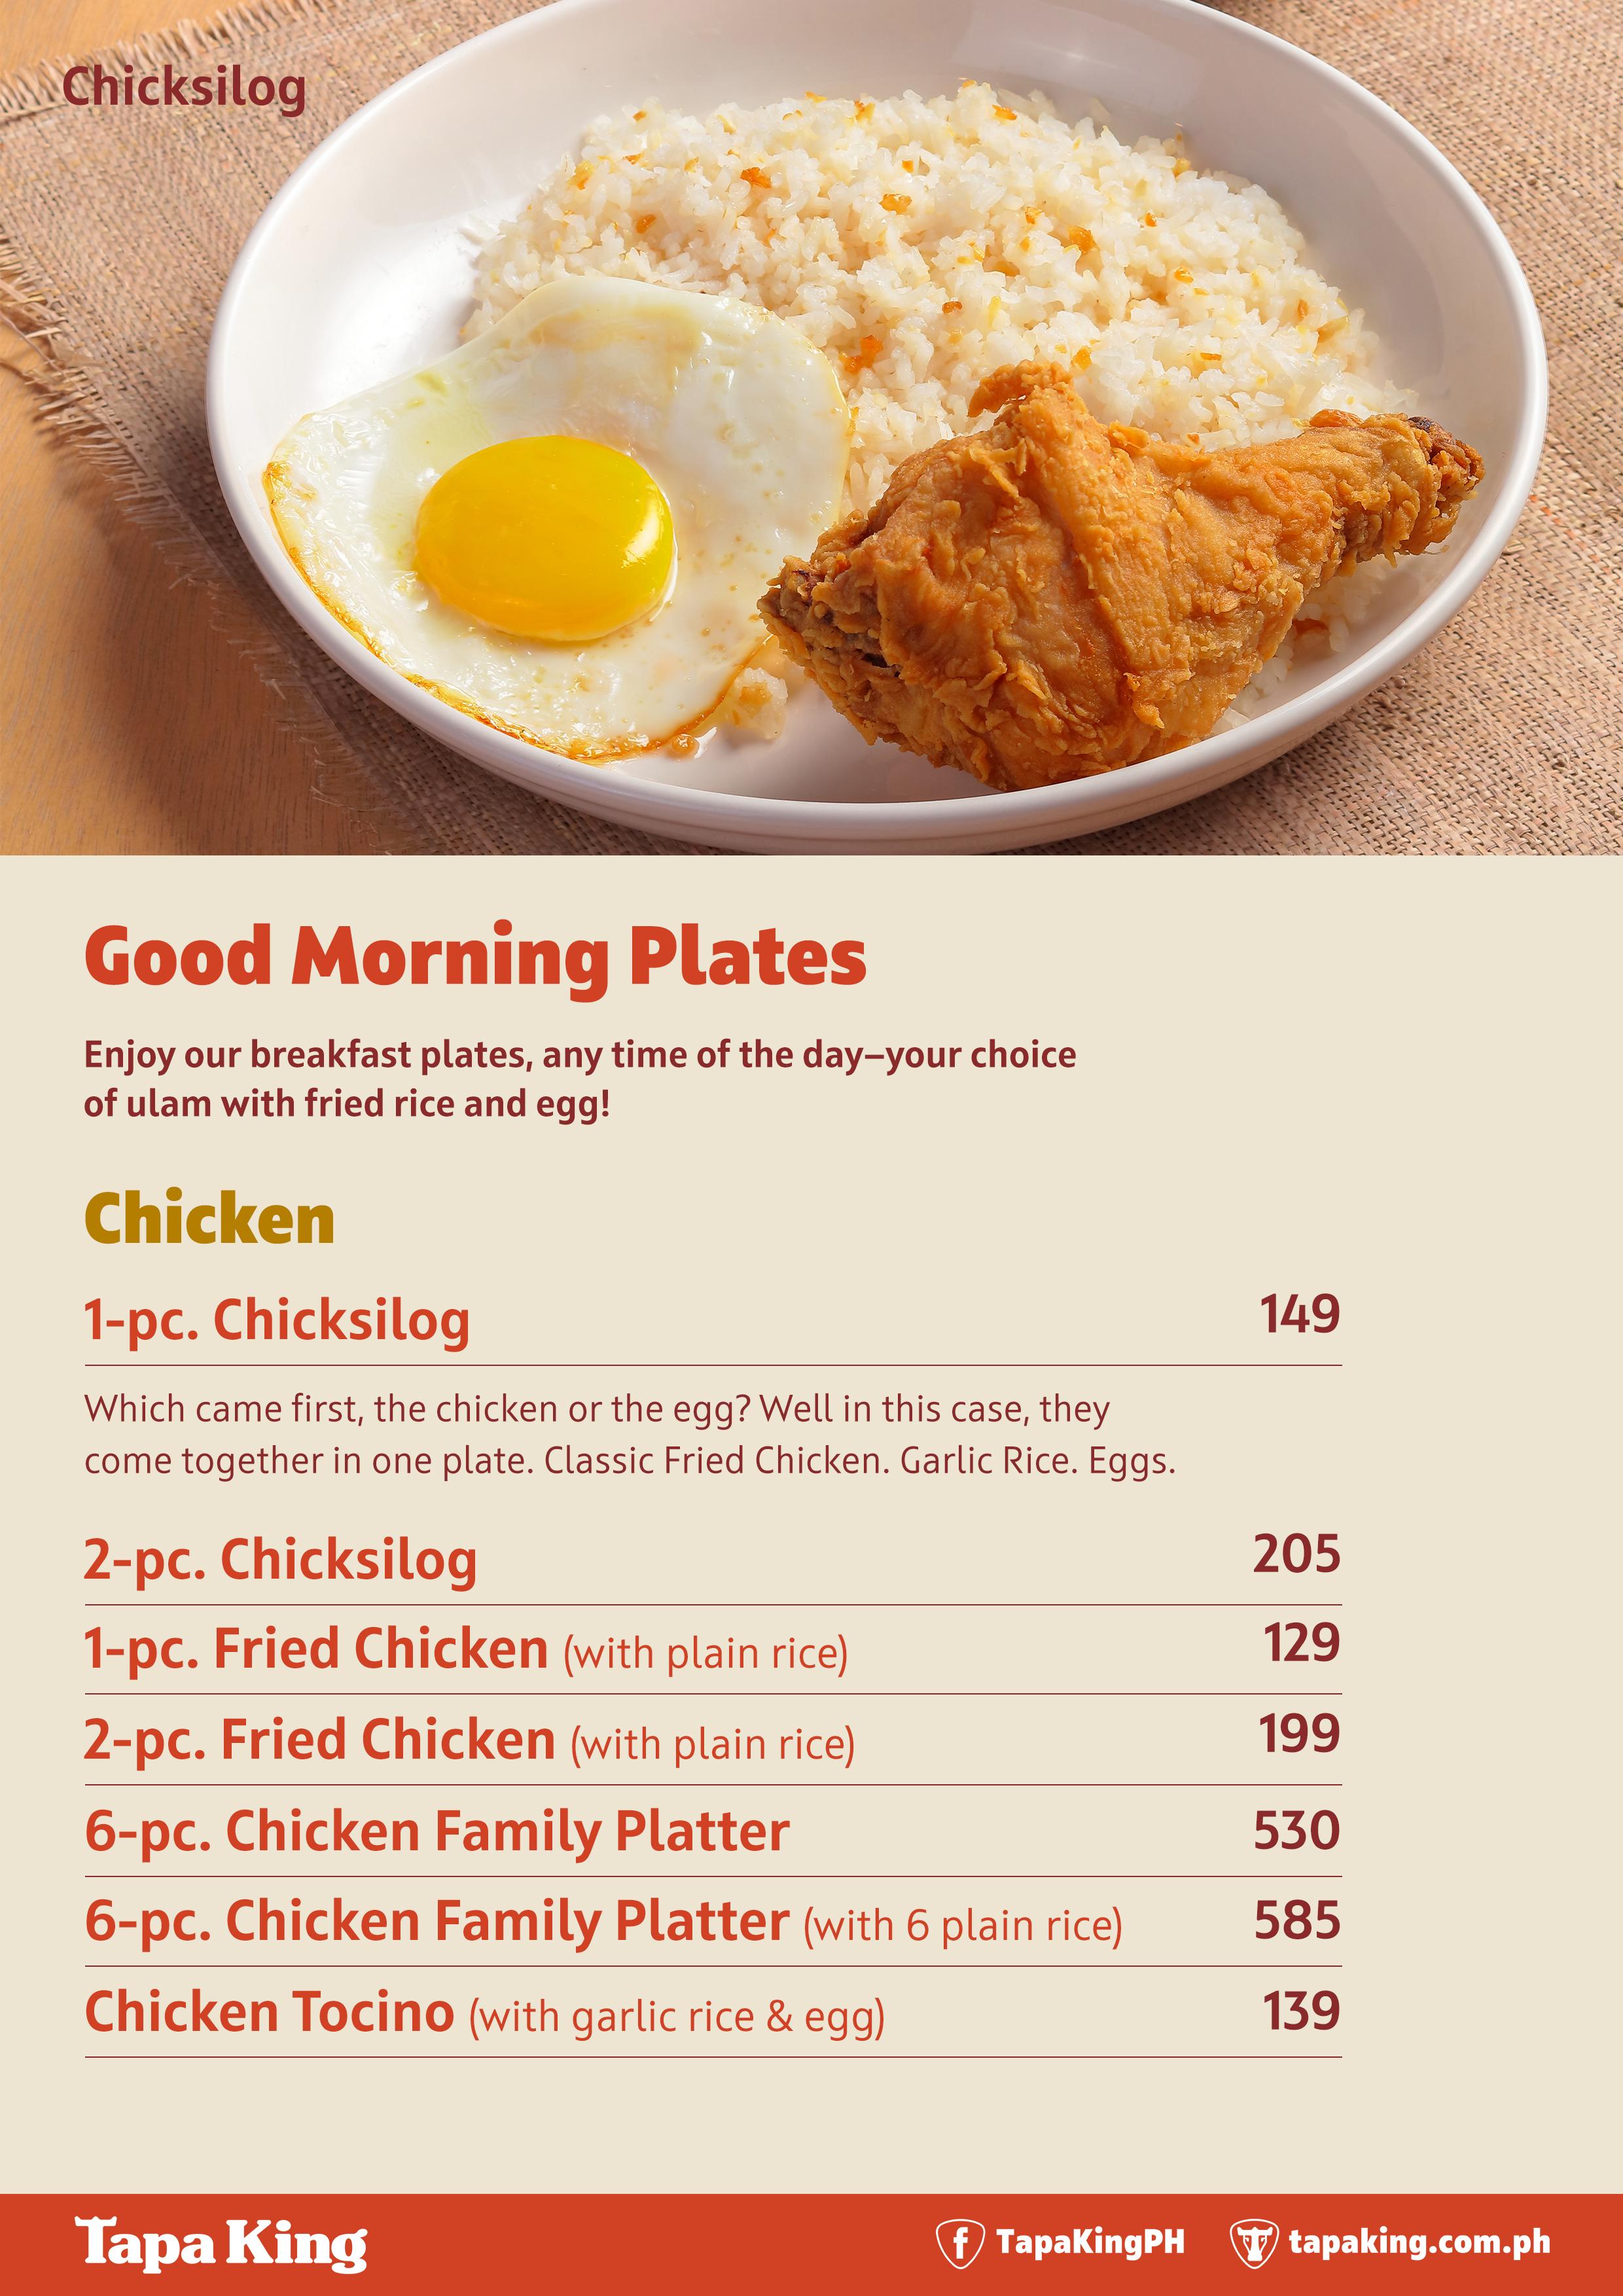 Good Morning Plates